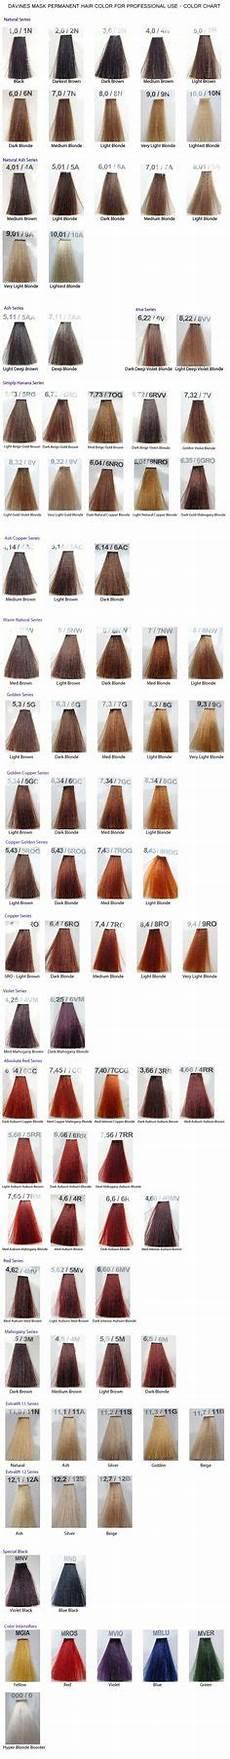 Davines Mask Colour Chart Koleston Perfect Color Shades Hair Pinterest